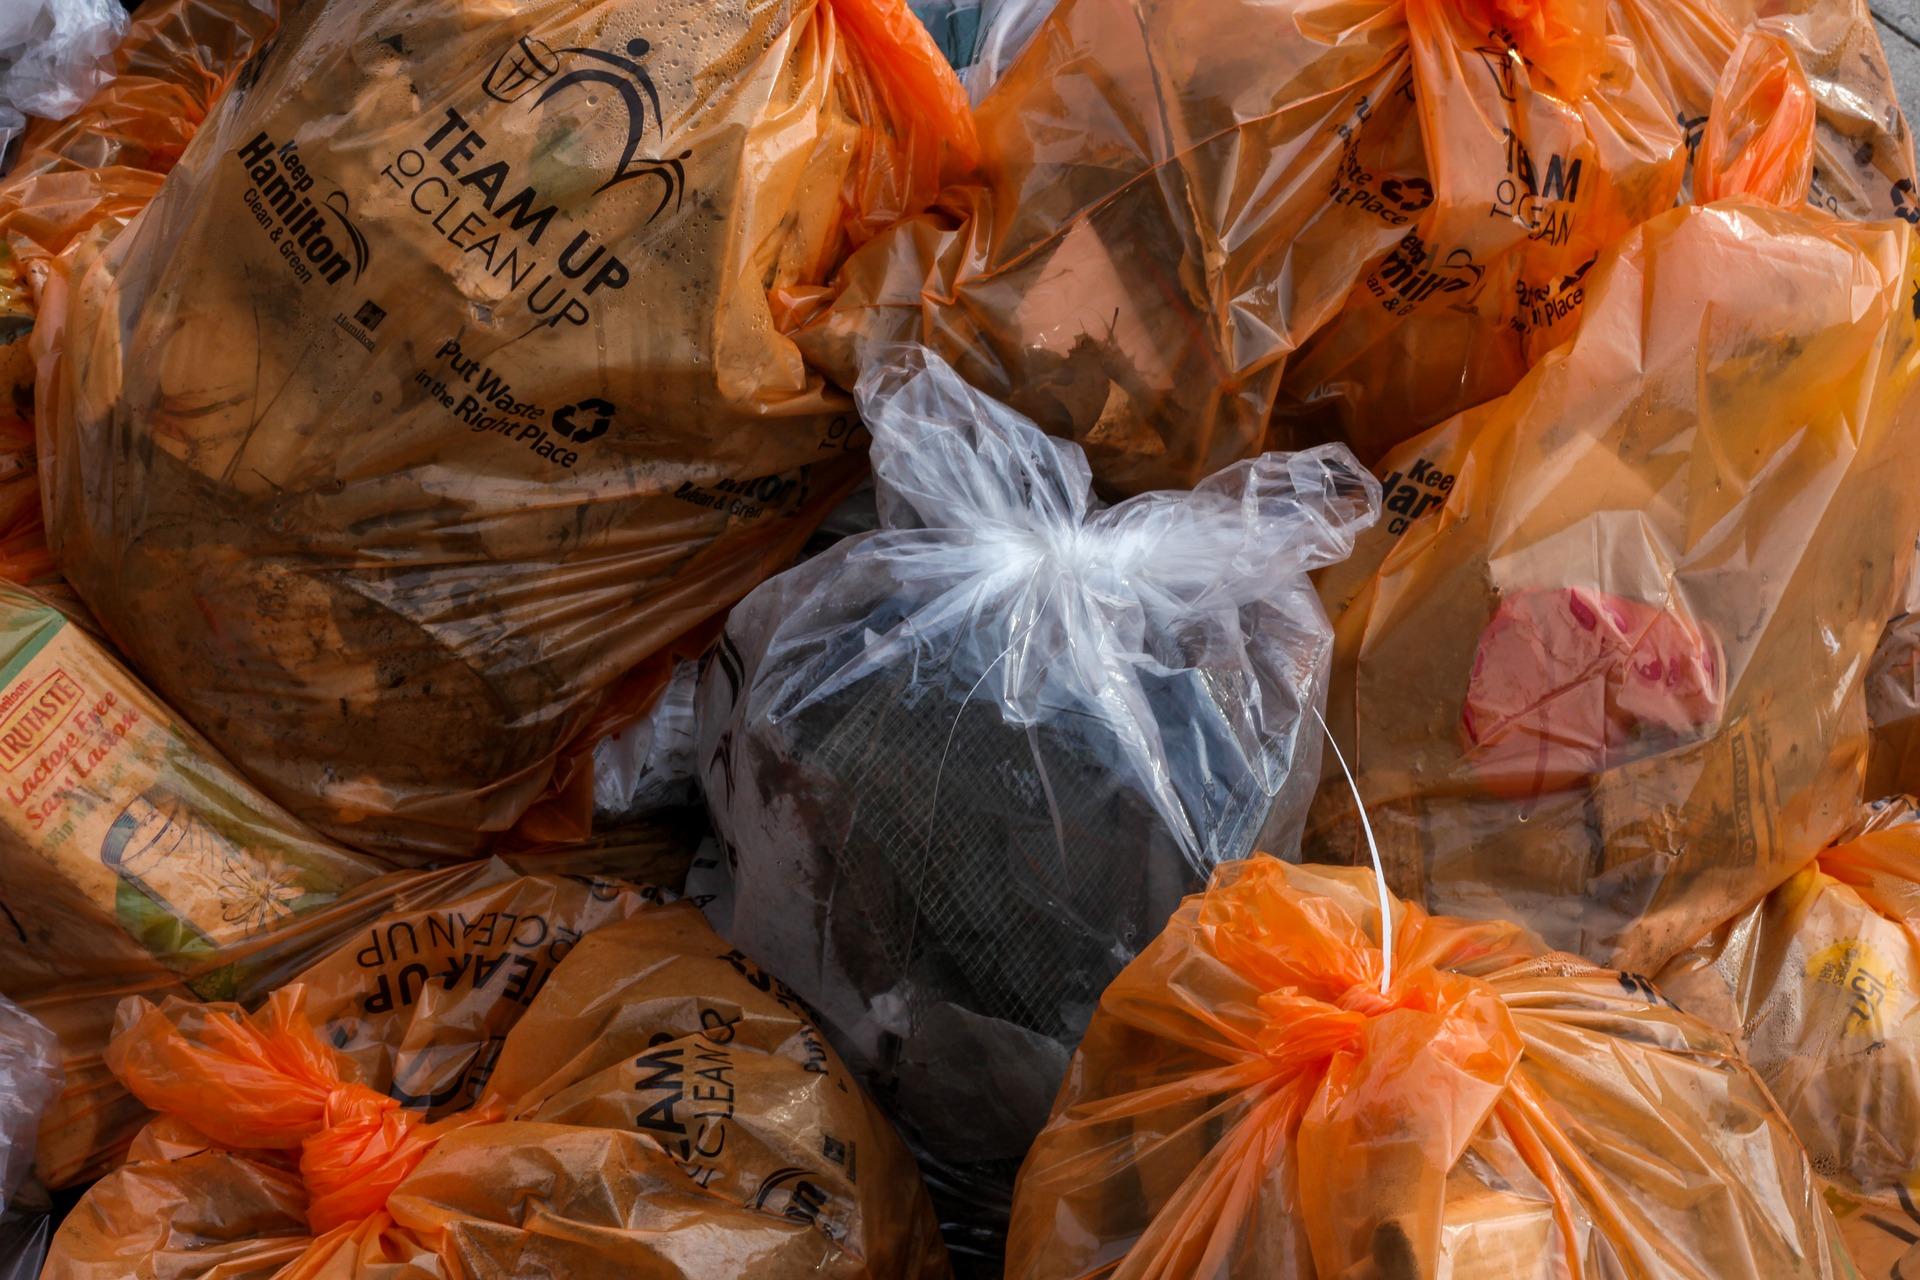 i sacchetti biodegradabili non si degradano